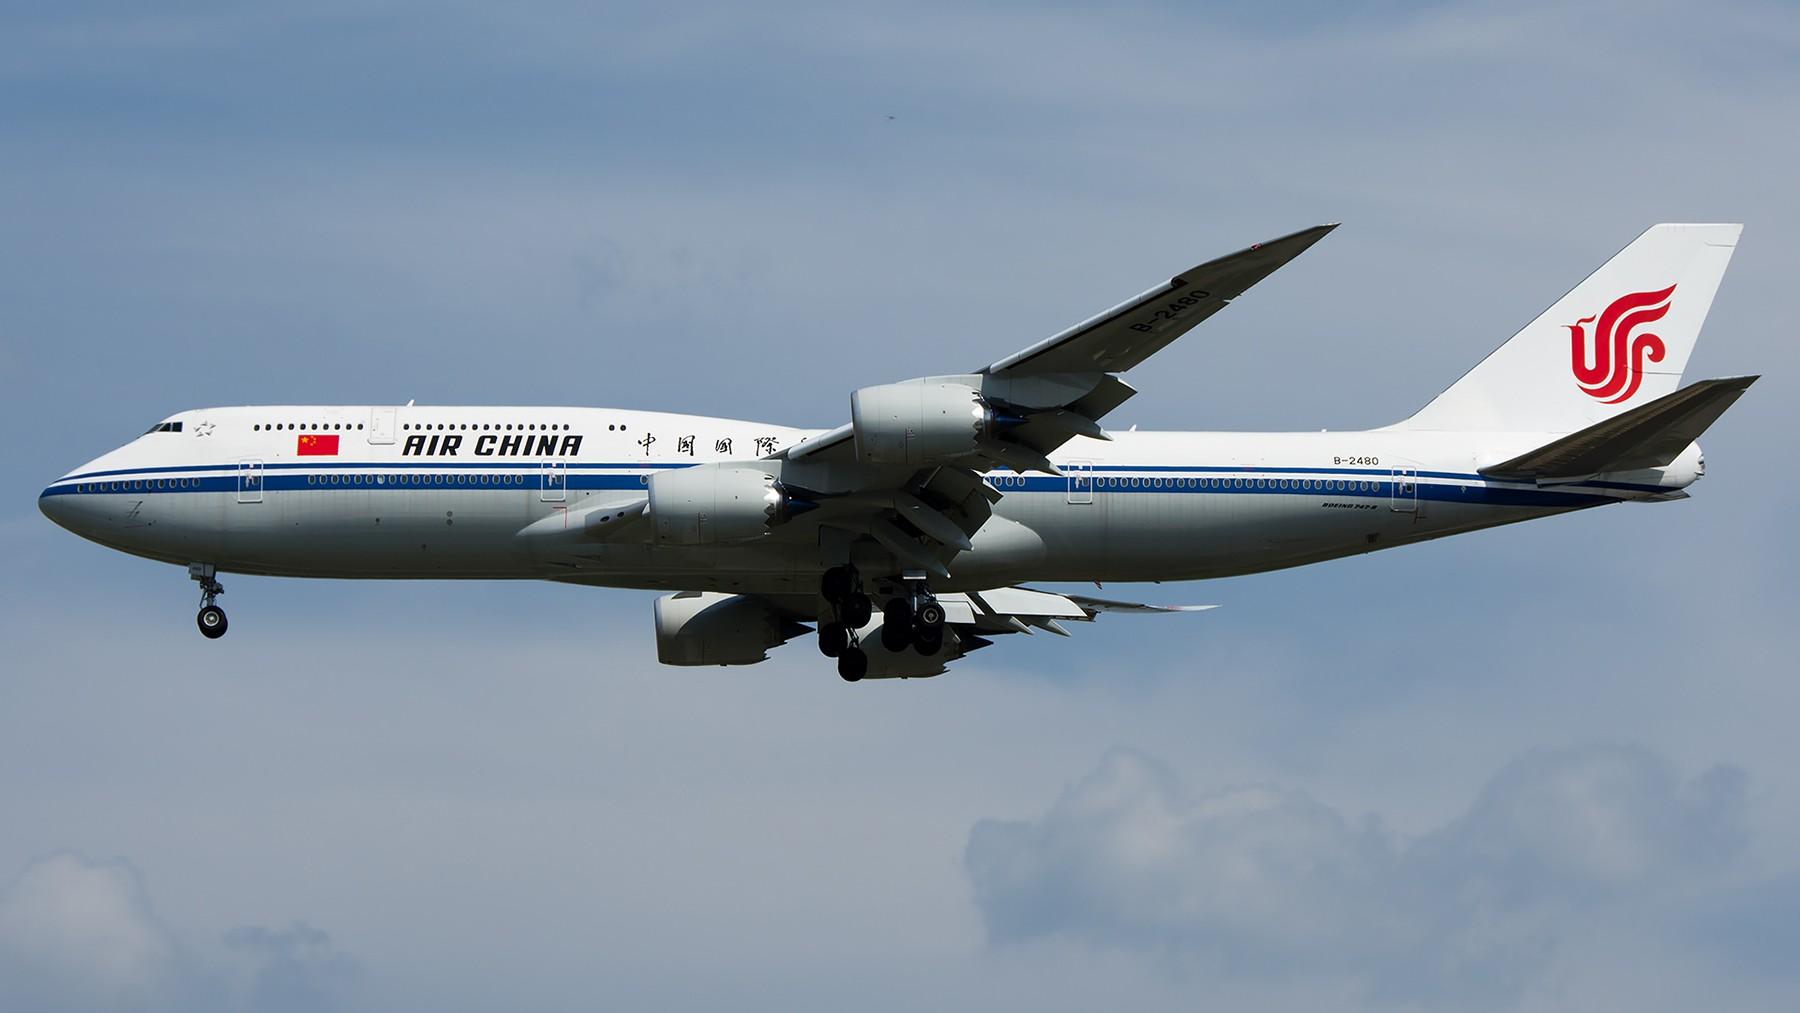 Re:[原创]终于放假了,出来冒个泡,随便发几张 BOEING 747-8I B-2480 中国北京首都国际机场